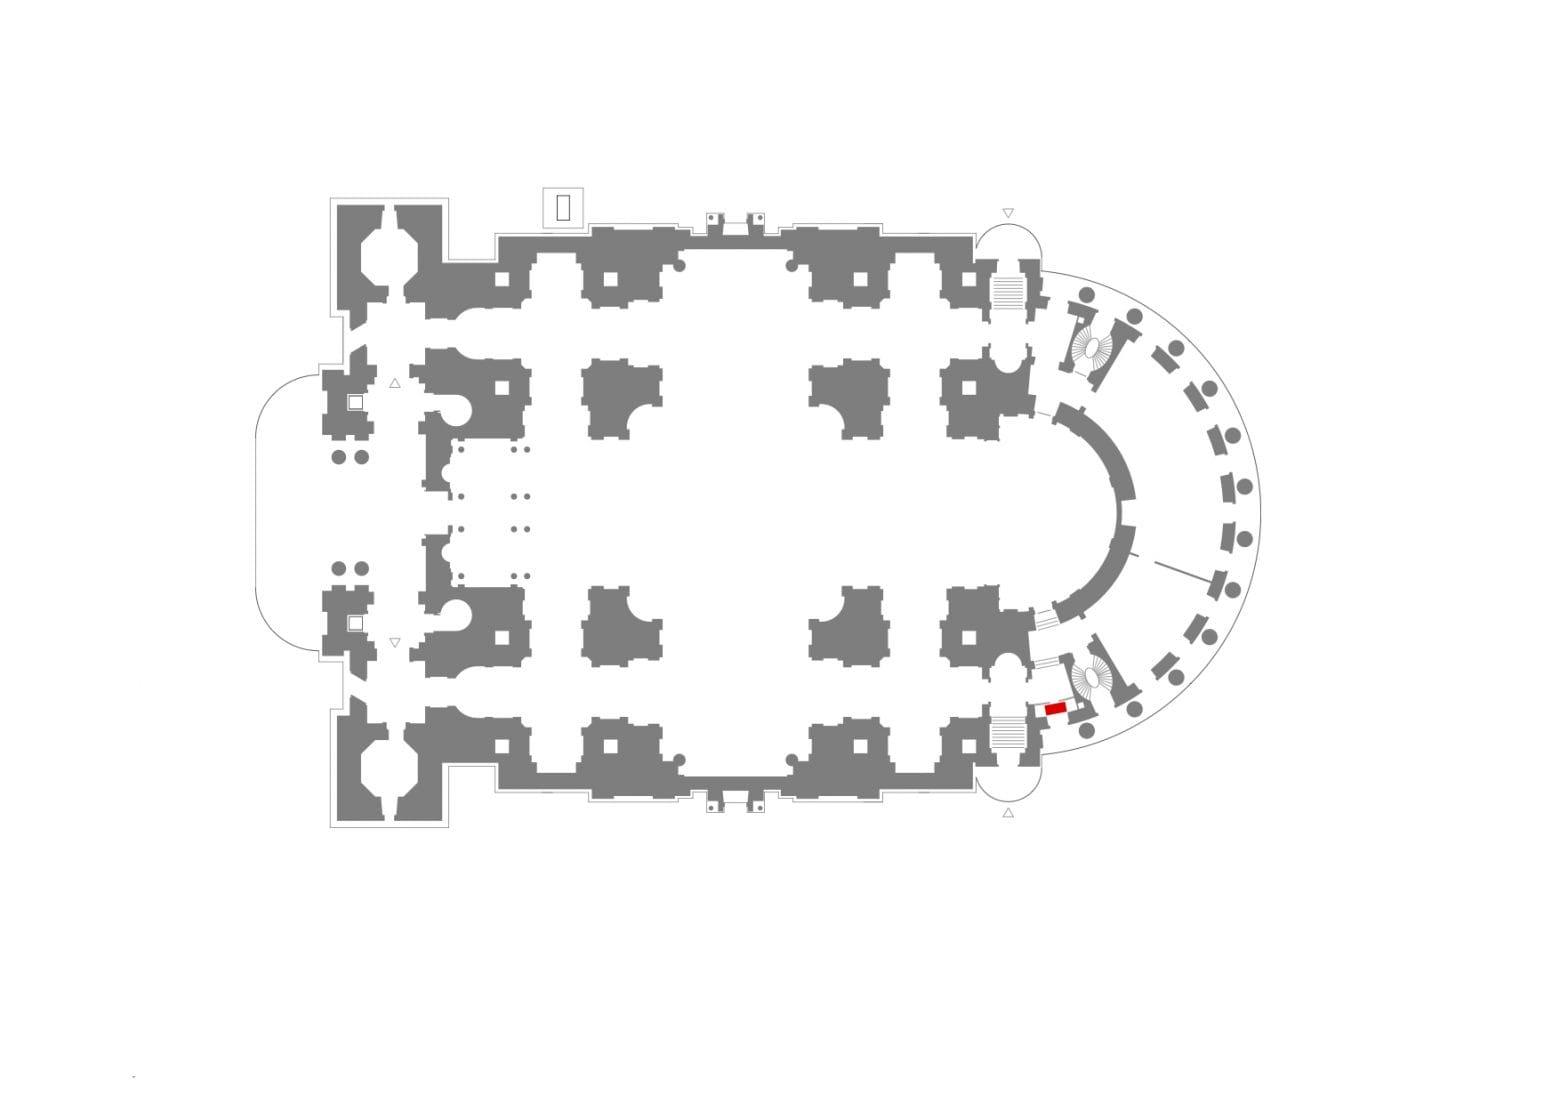 Bazilika sekrestyefelvono_abra